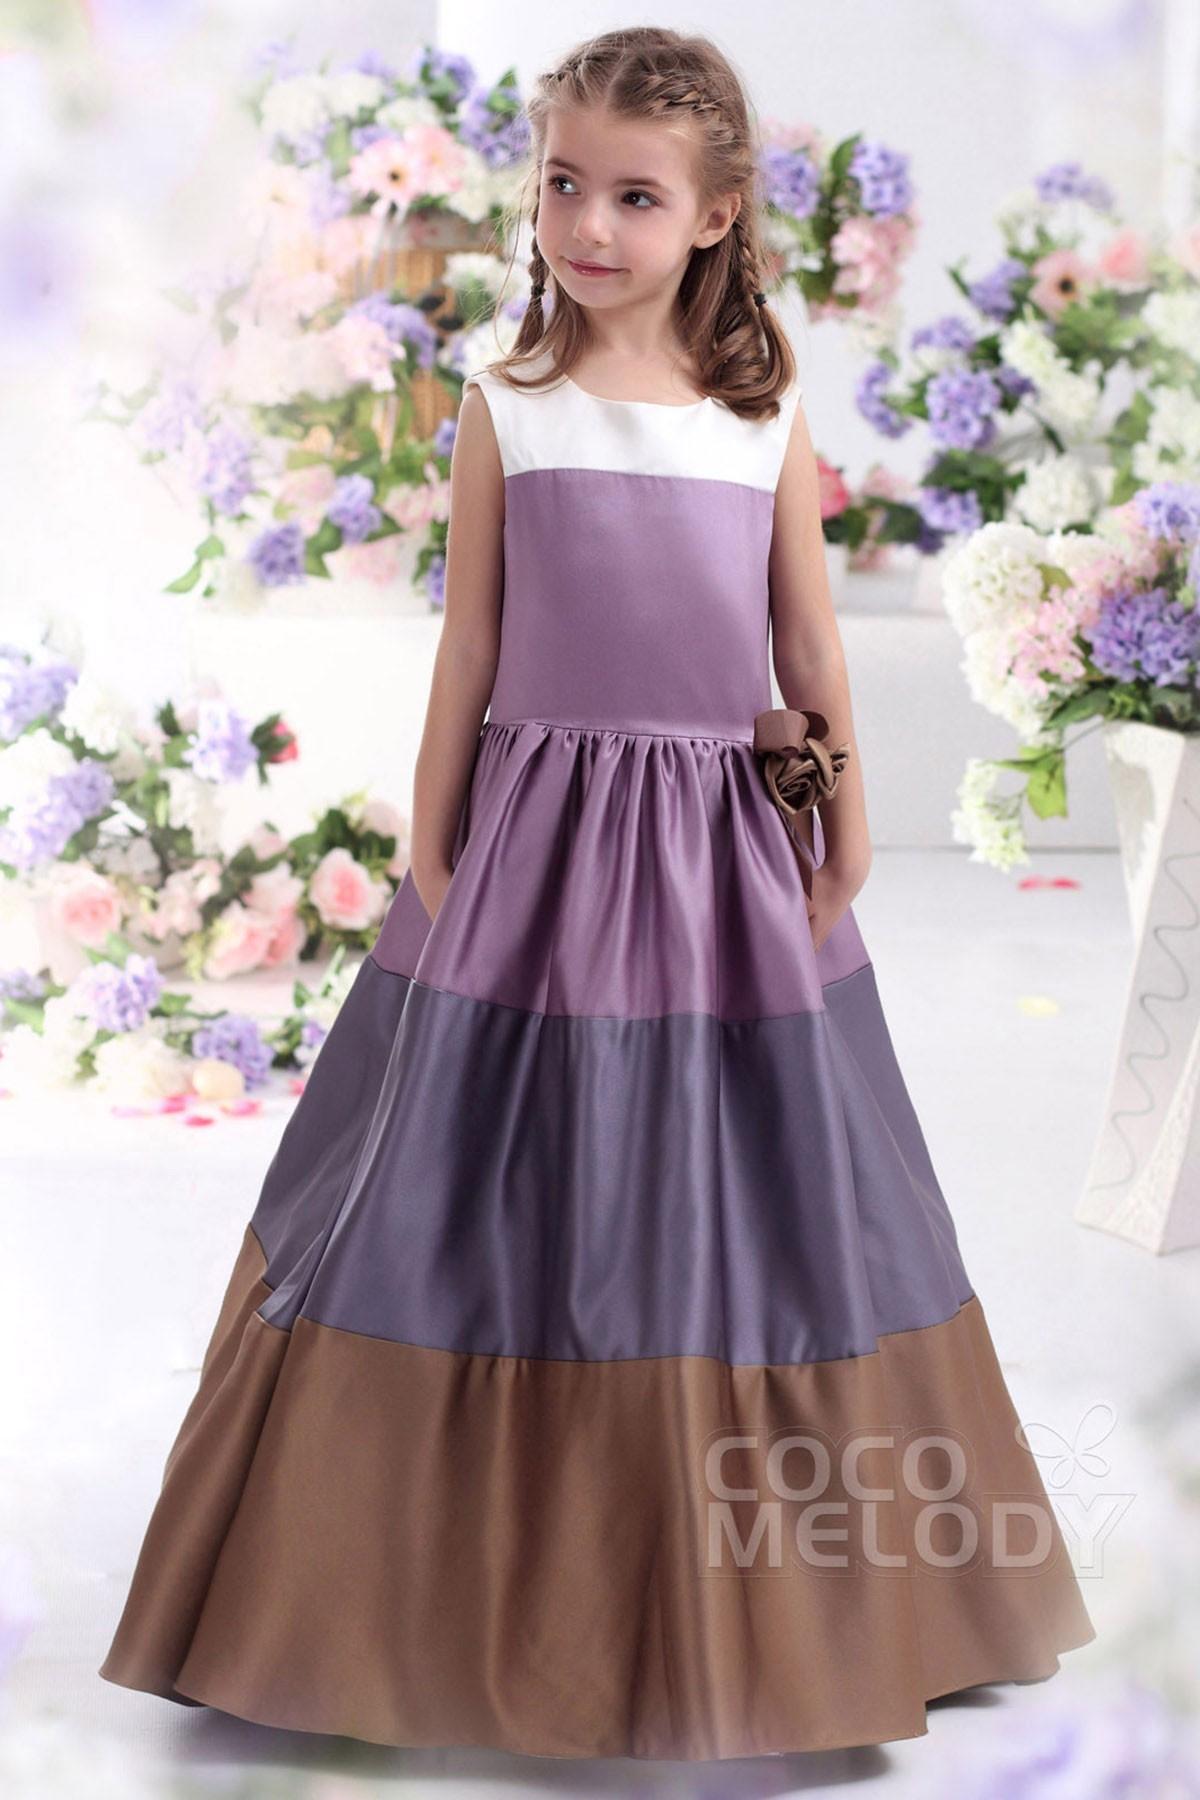 A Line Floor Length Satin Girls Christmas Dress CKZF13003 | Cocomelody